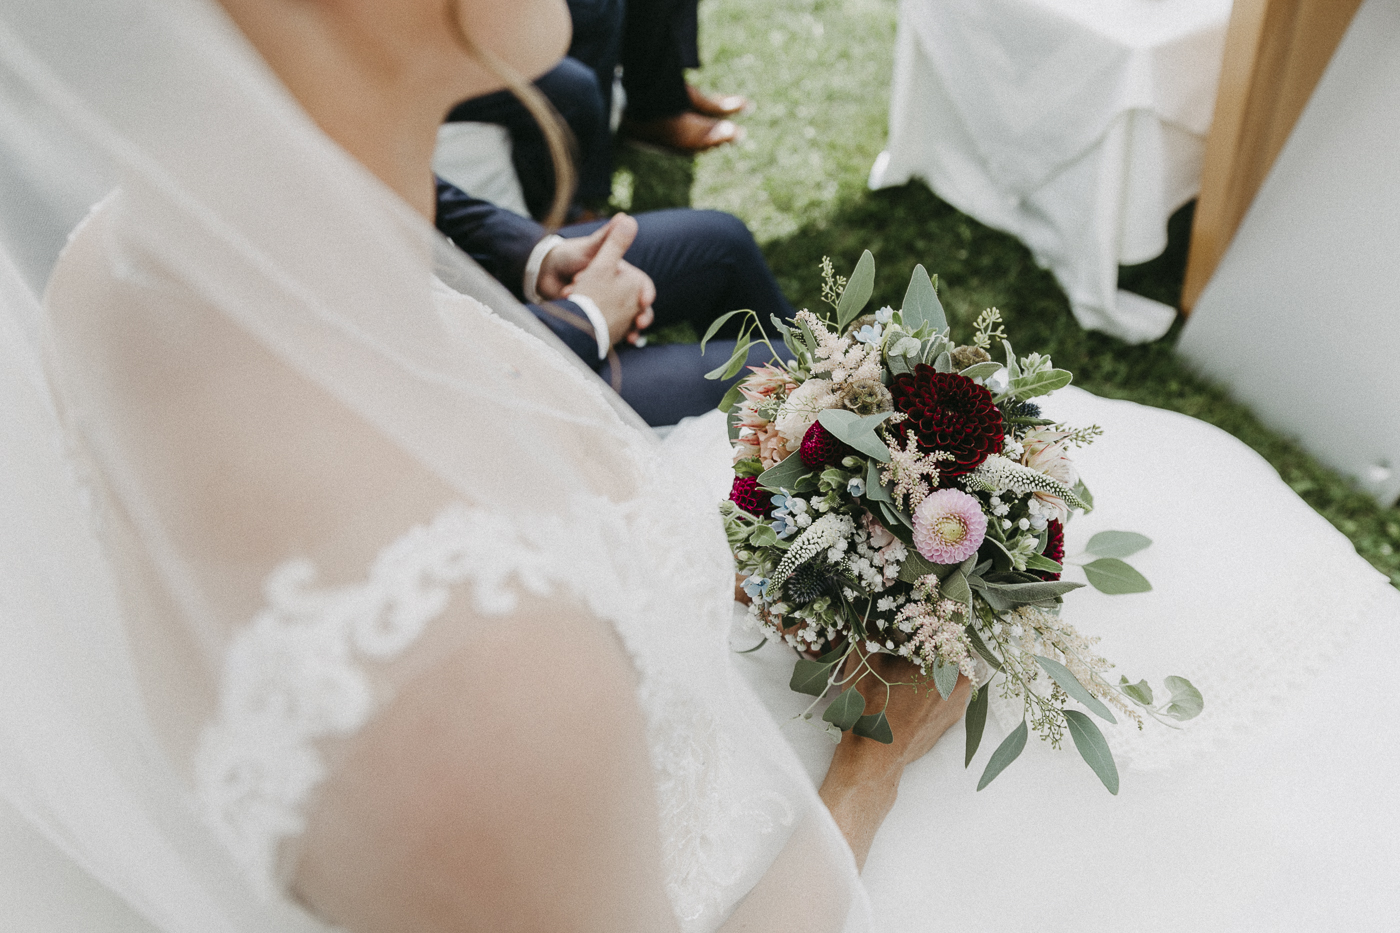 rosemarrylemon_ND_Hochzeit_Hochzeitsplanung15.jpg